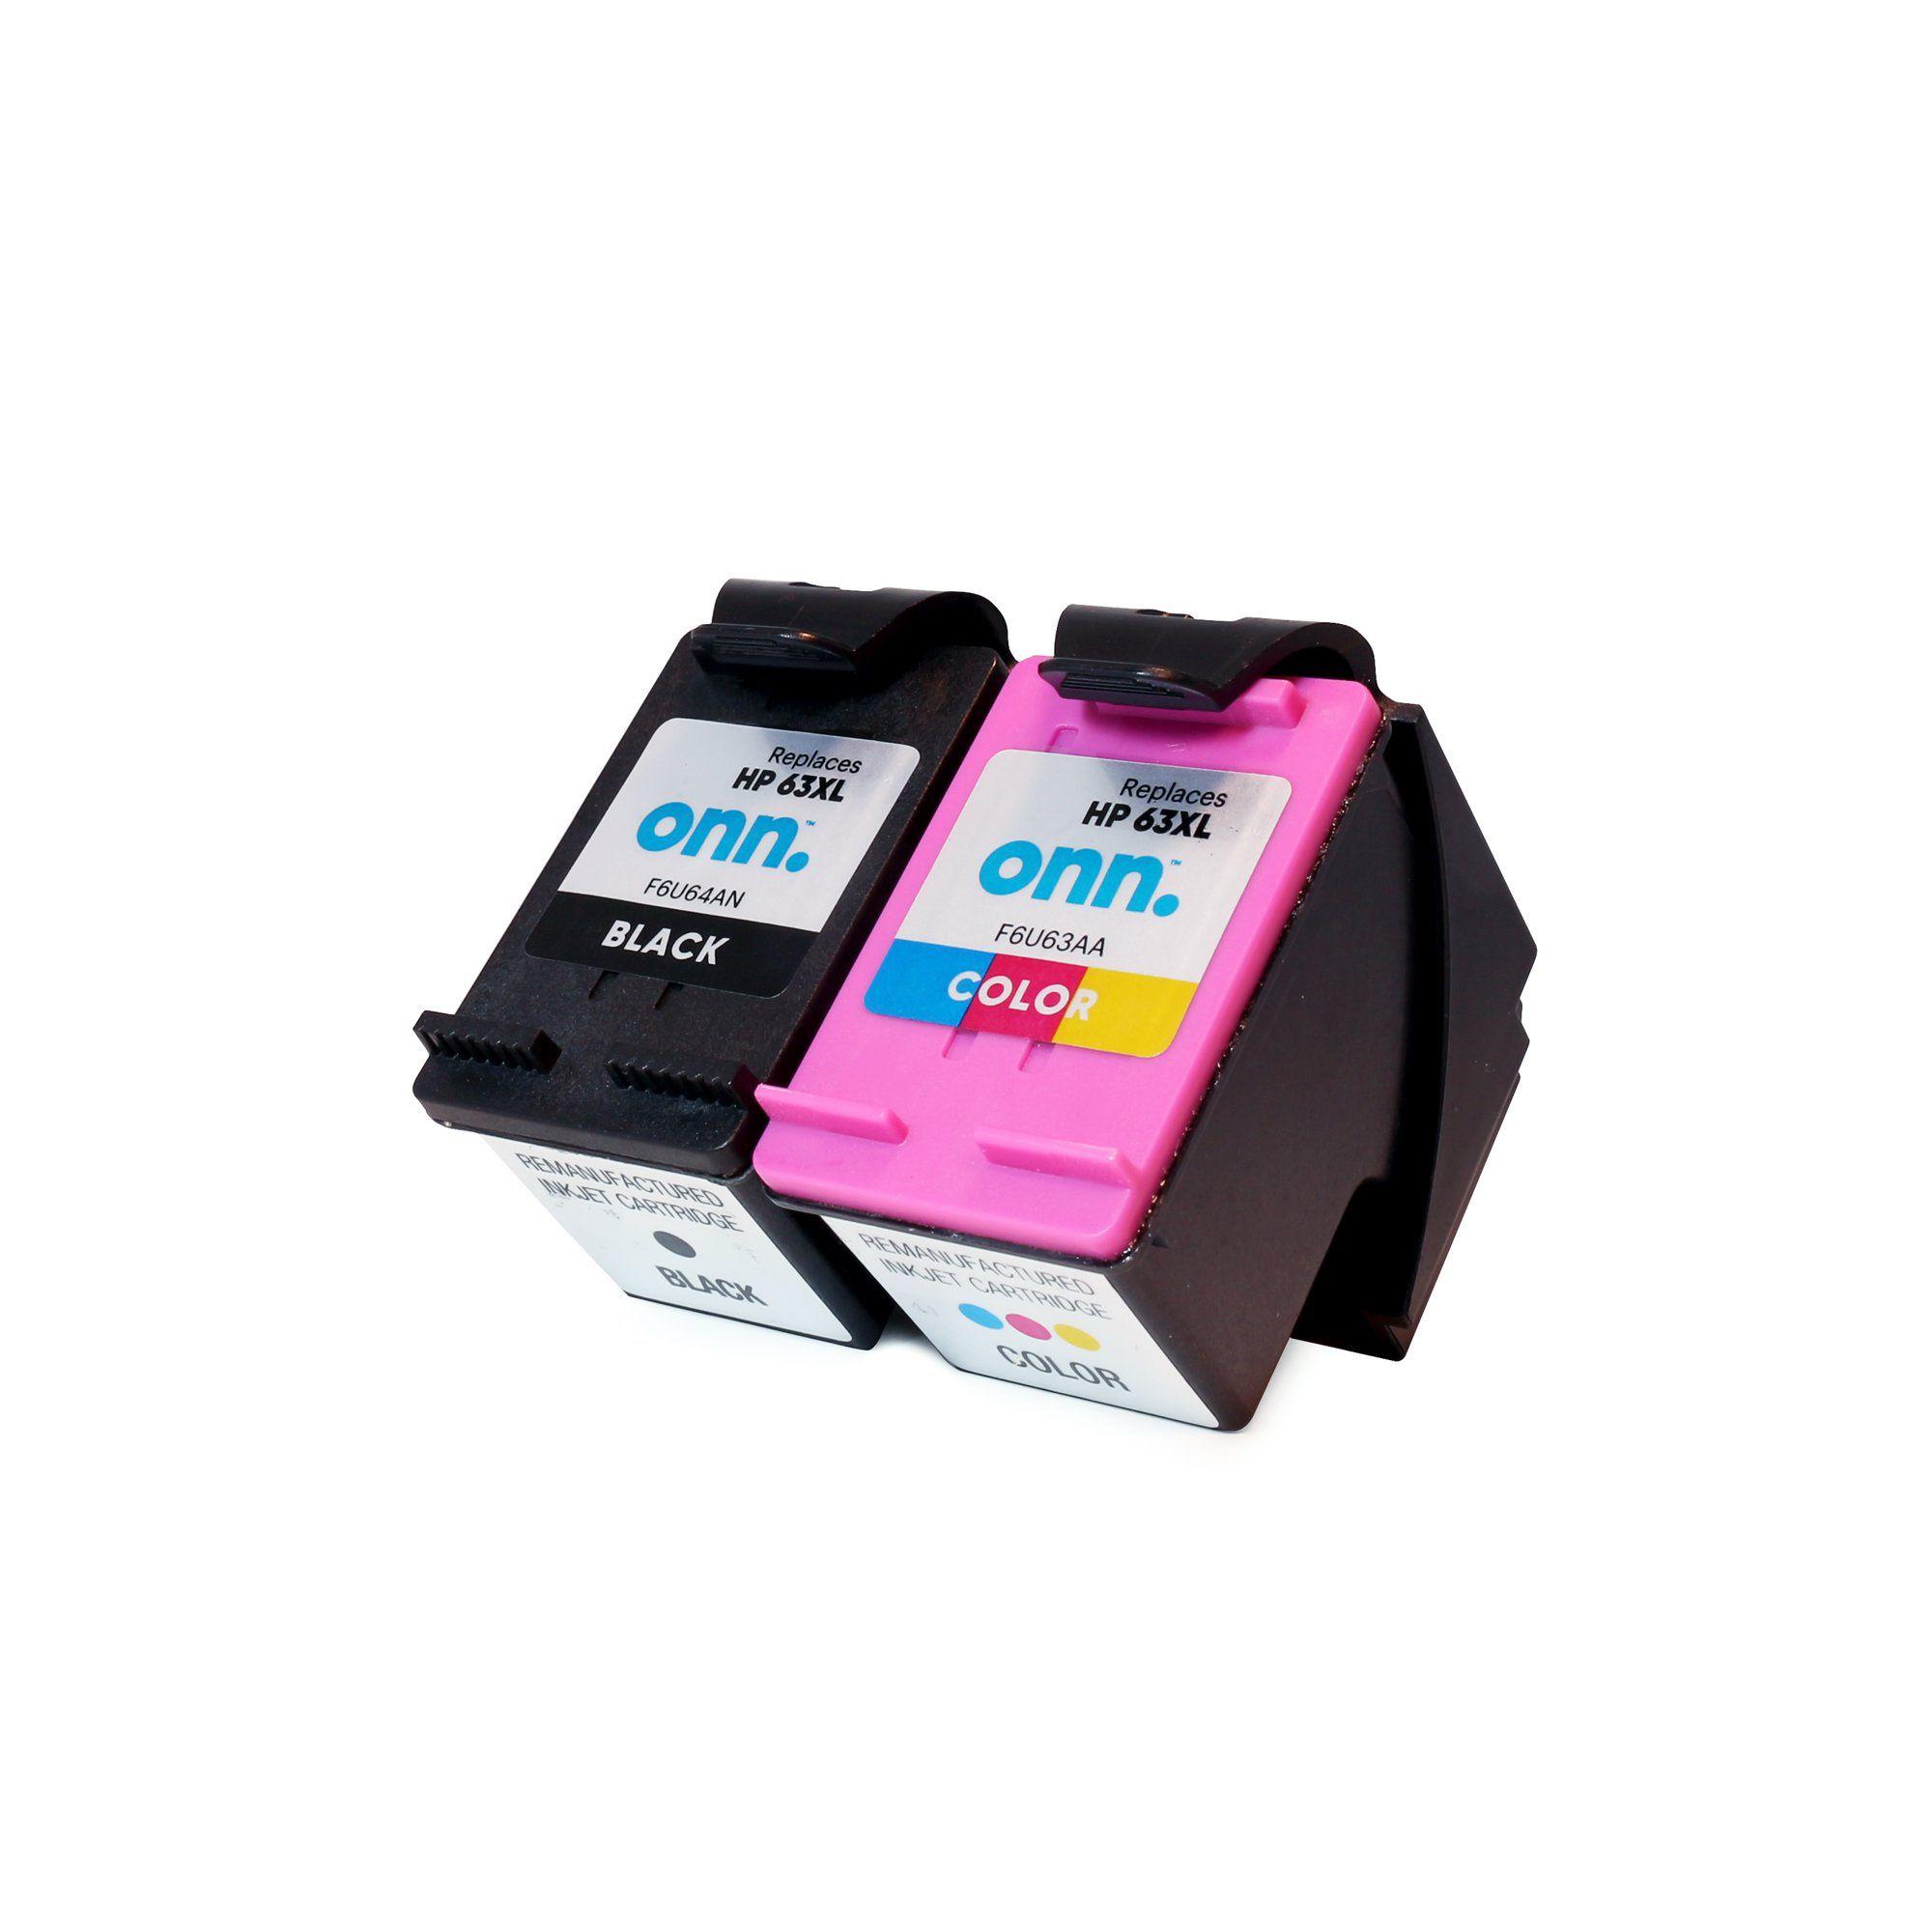 Brand New onn. Remanufactured Ink Cartridge, HP 63XL Black, 63XL Tri-Color, 2 Cartridges